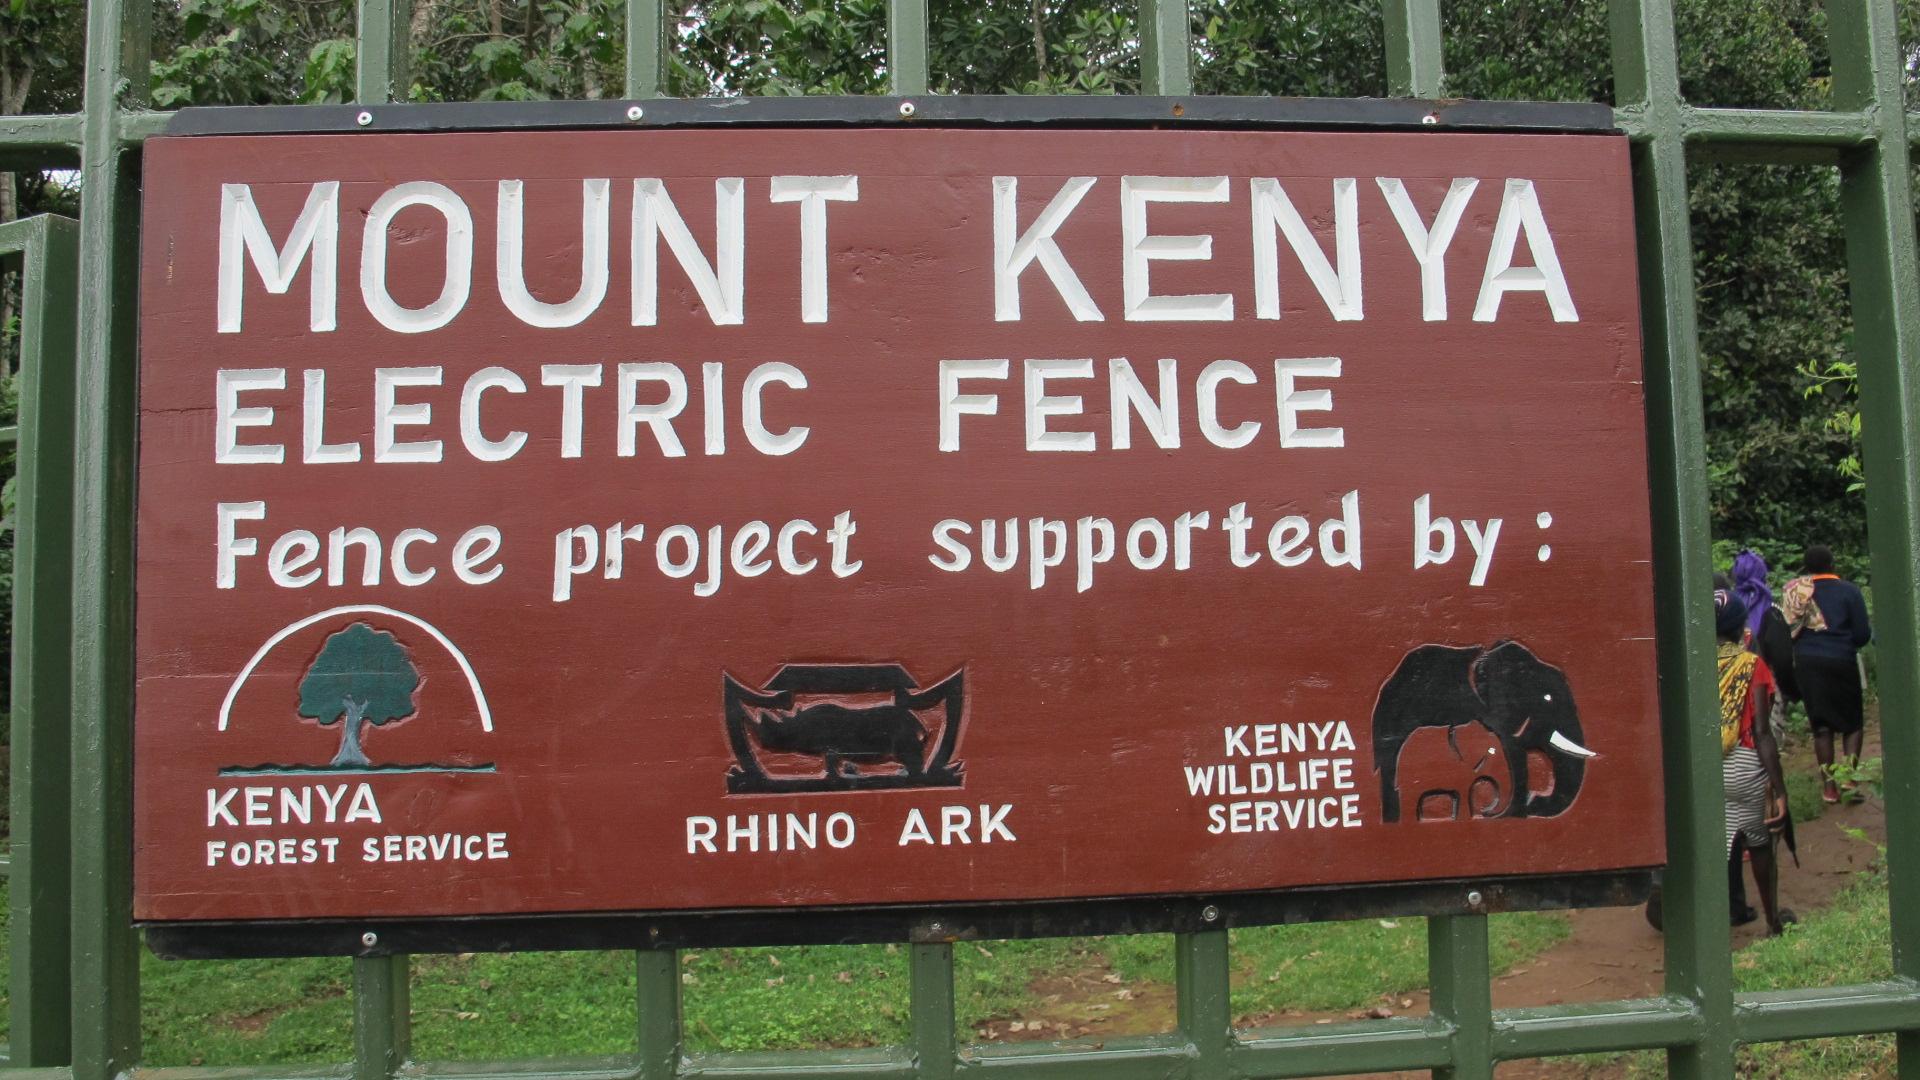 Mt. Kenya Fence